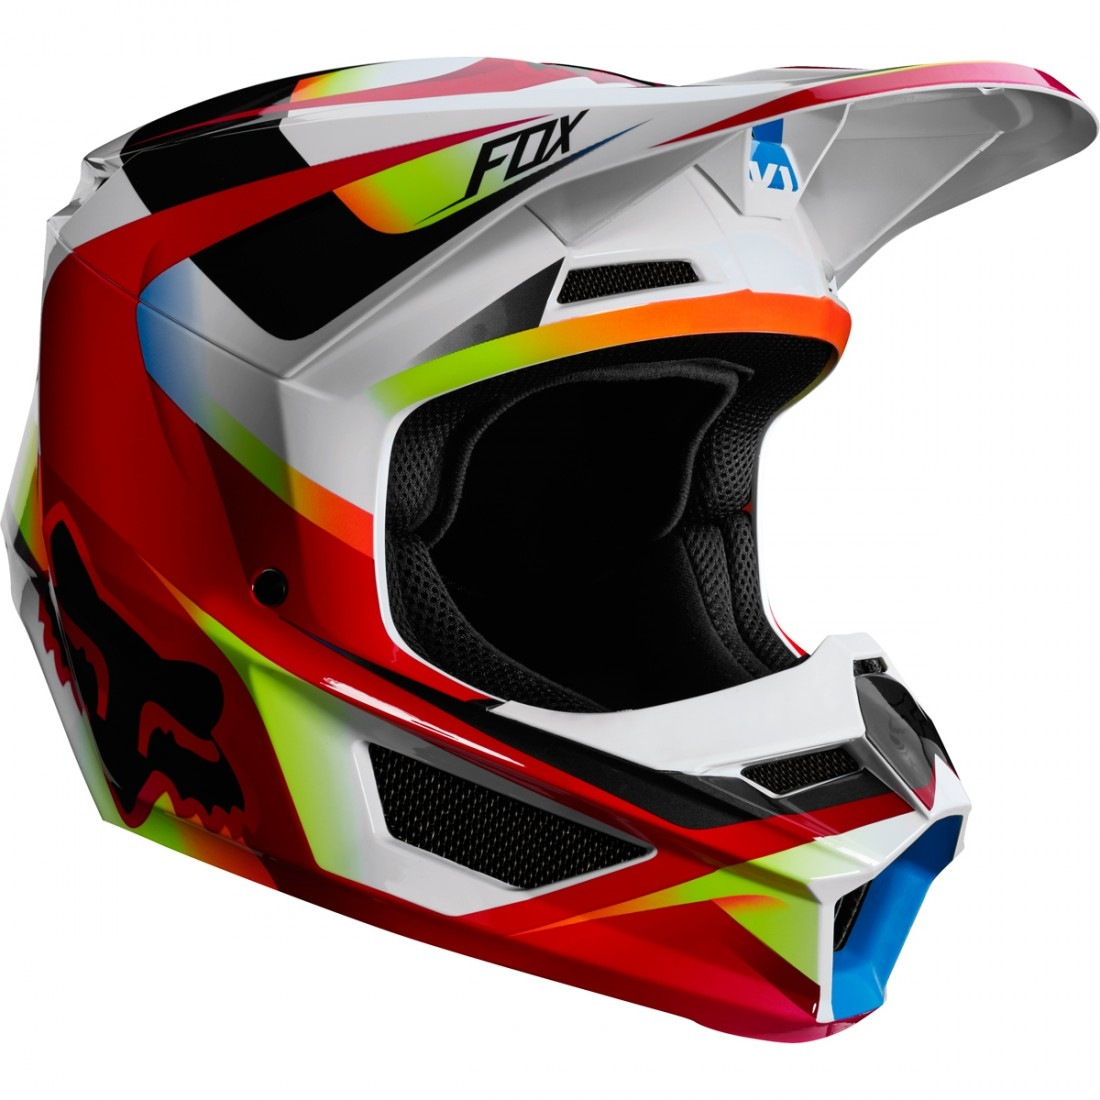 96eb8d739a99b FOX V1 Motif 2019 Red   White Helmet · Motocard